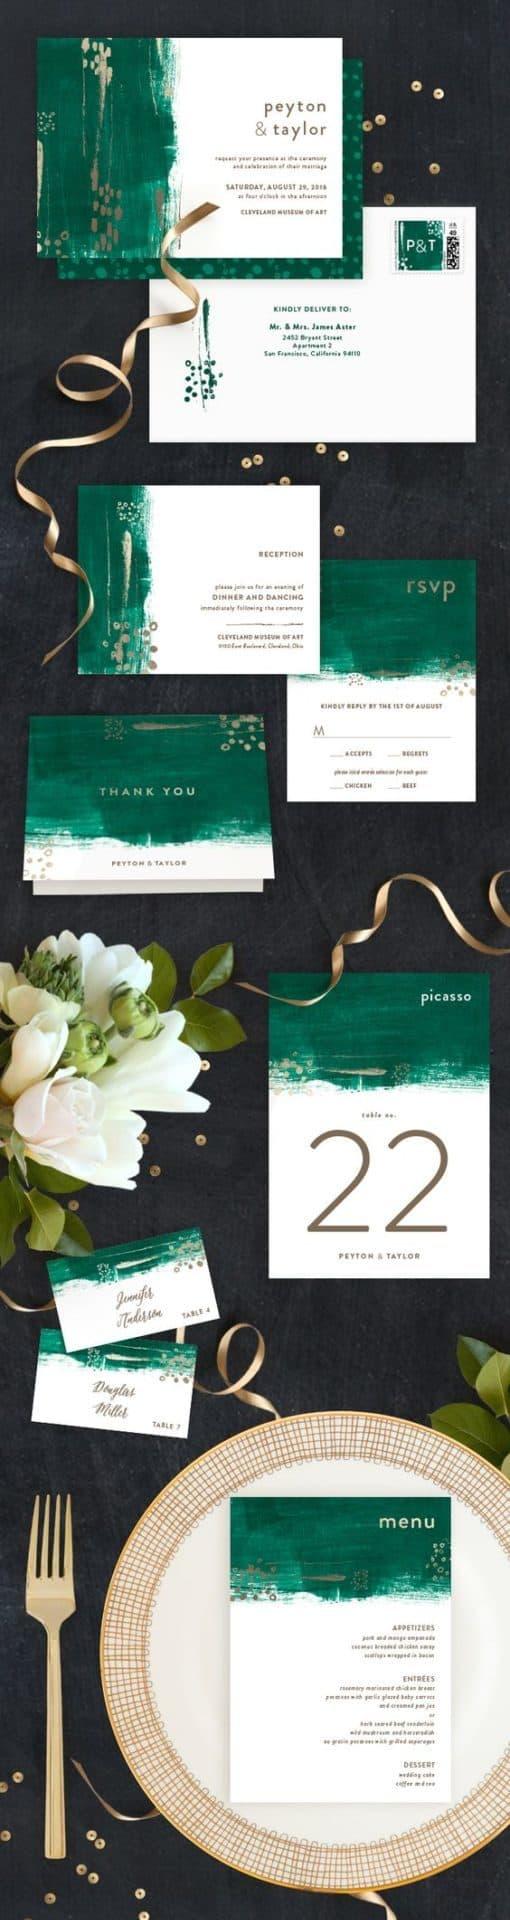 gold foil wedding invitations customizable wedding invitations Painted Canvas Customizable Foil pressed Wedding Invitation by Minted